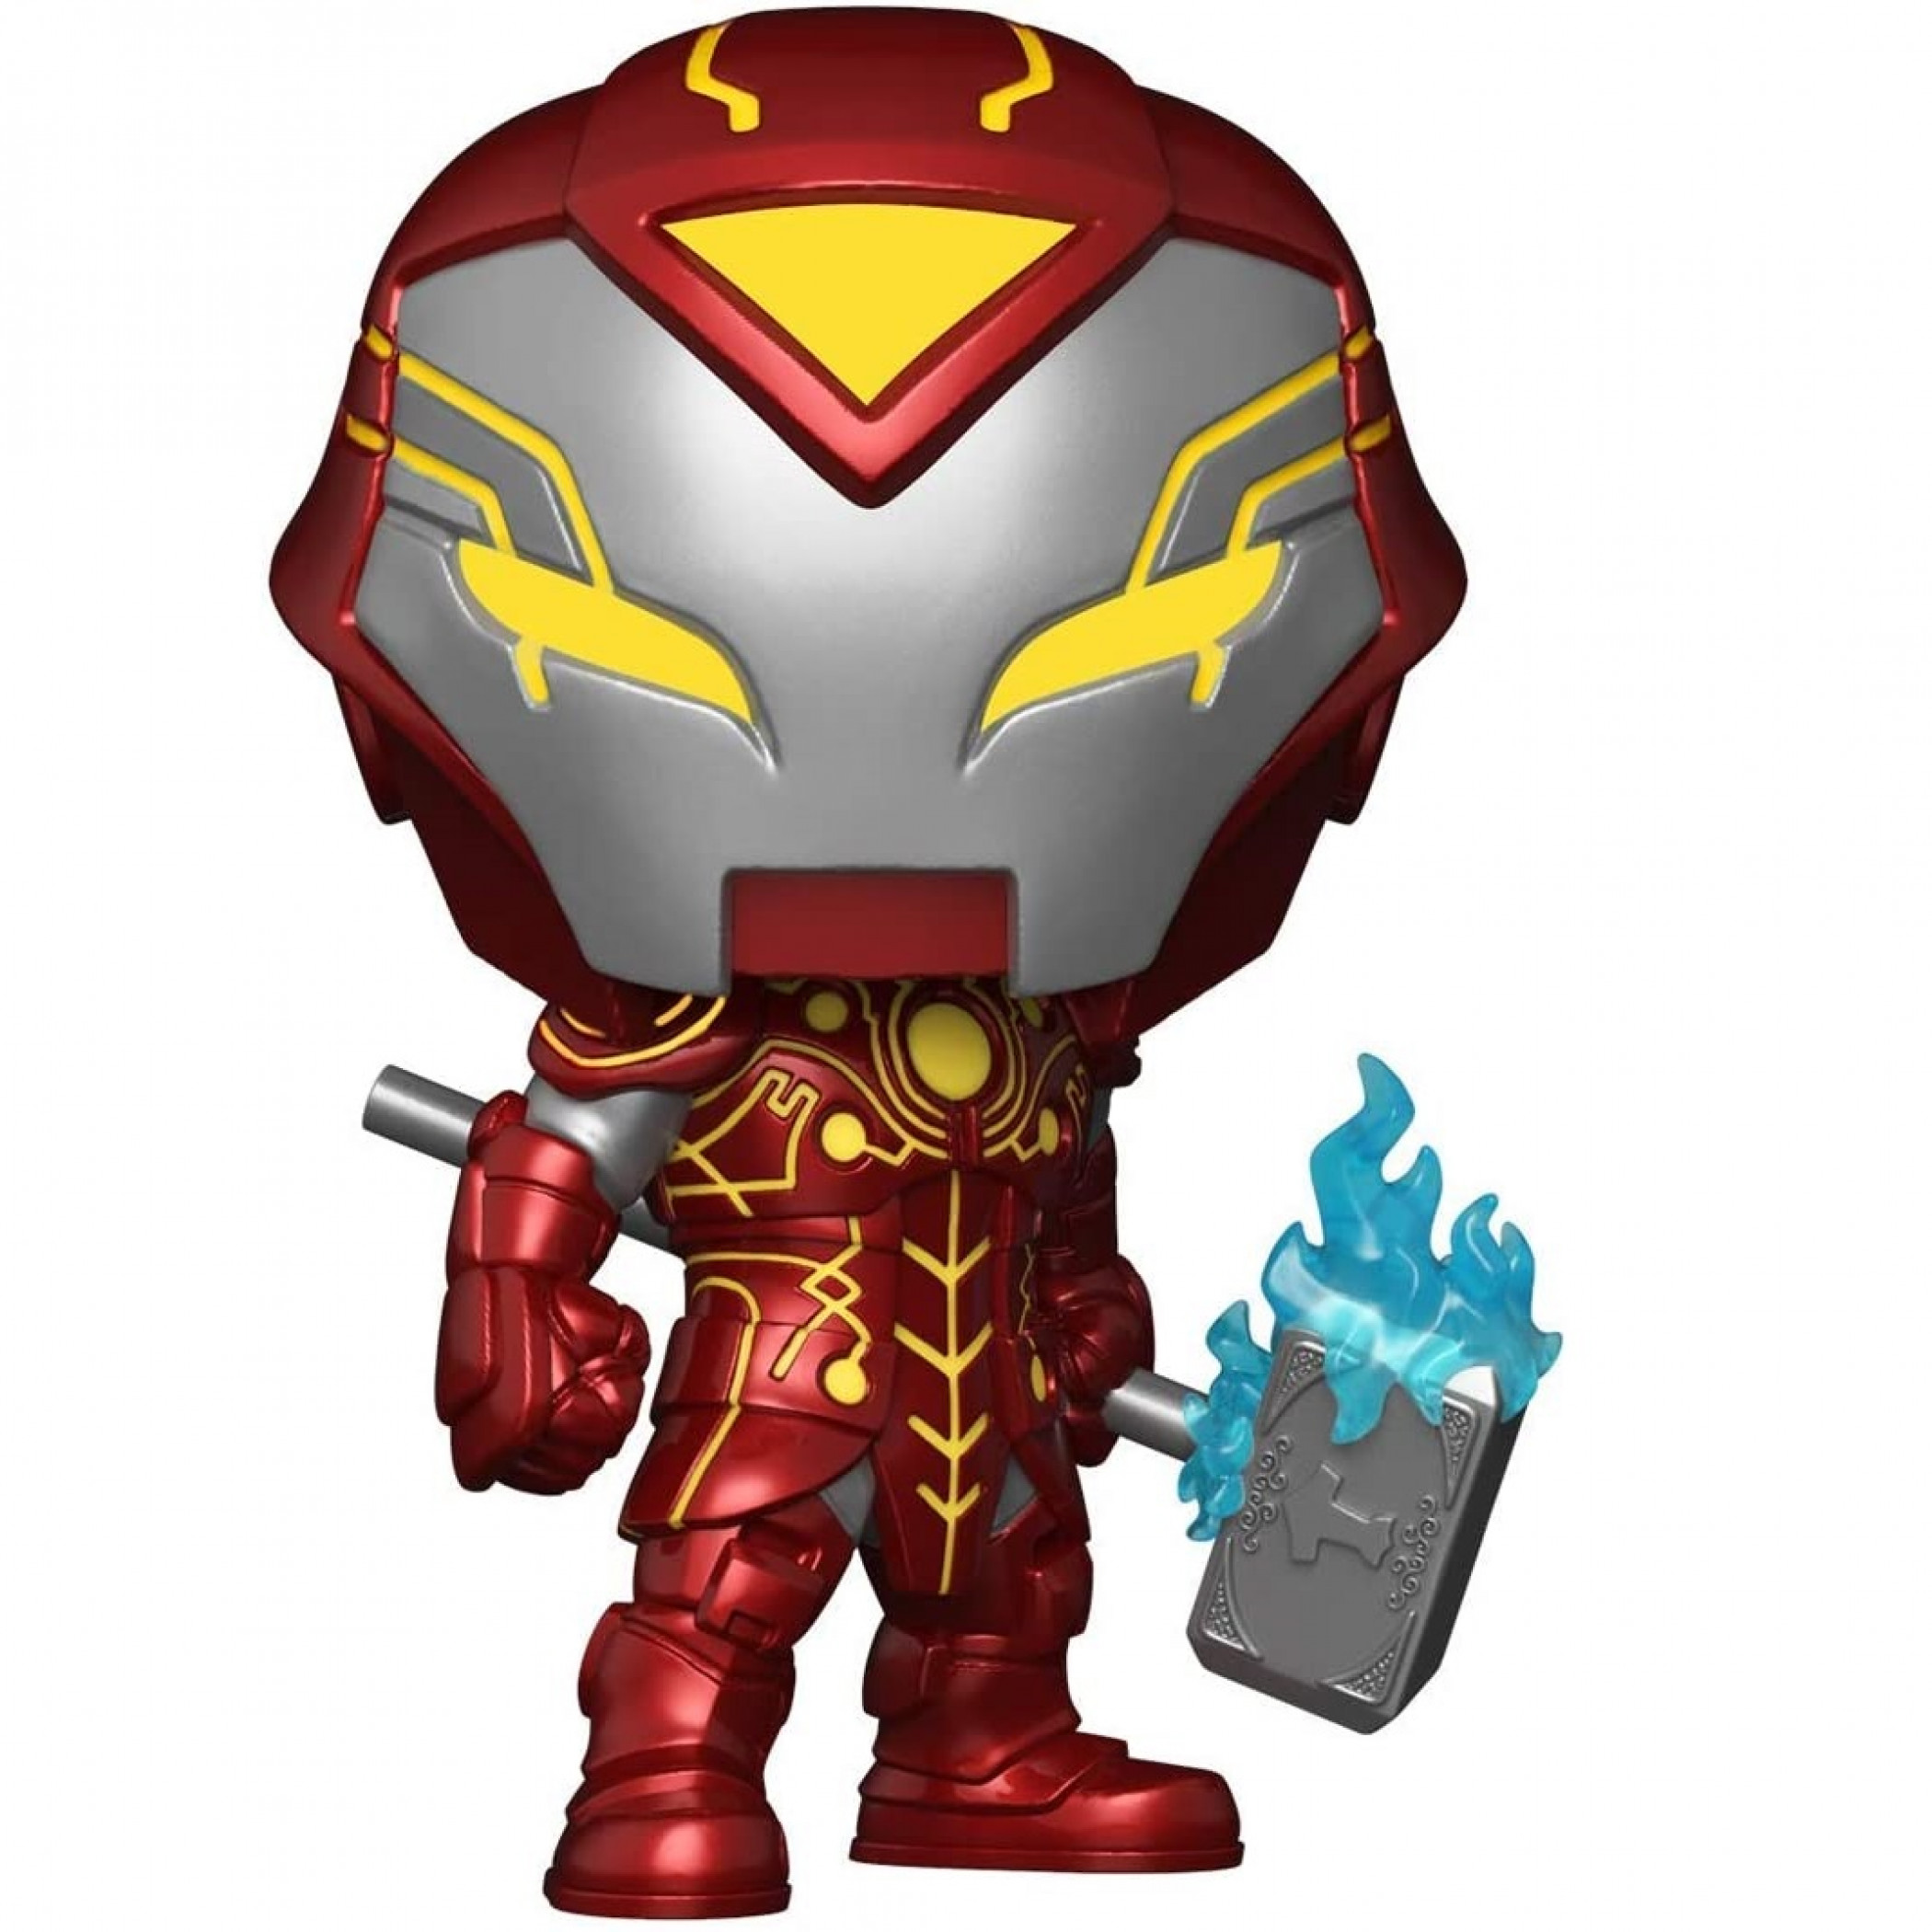 Marvel Infinity Warps Iron Hammer Funko Pop! Vinyl Figure